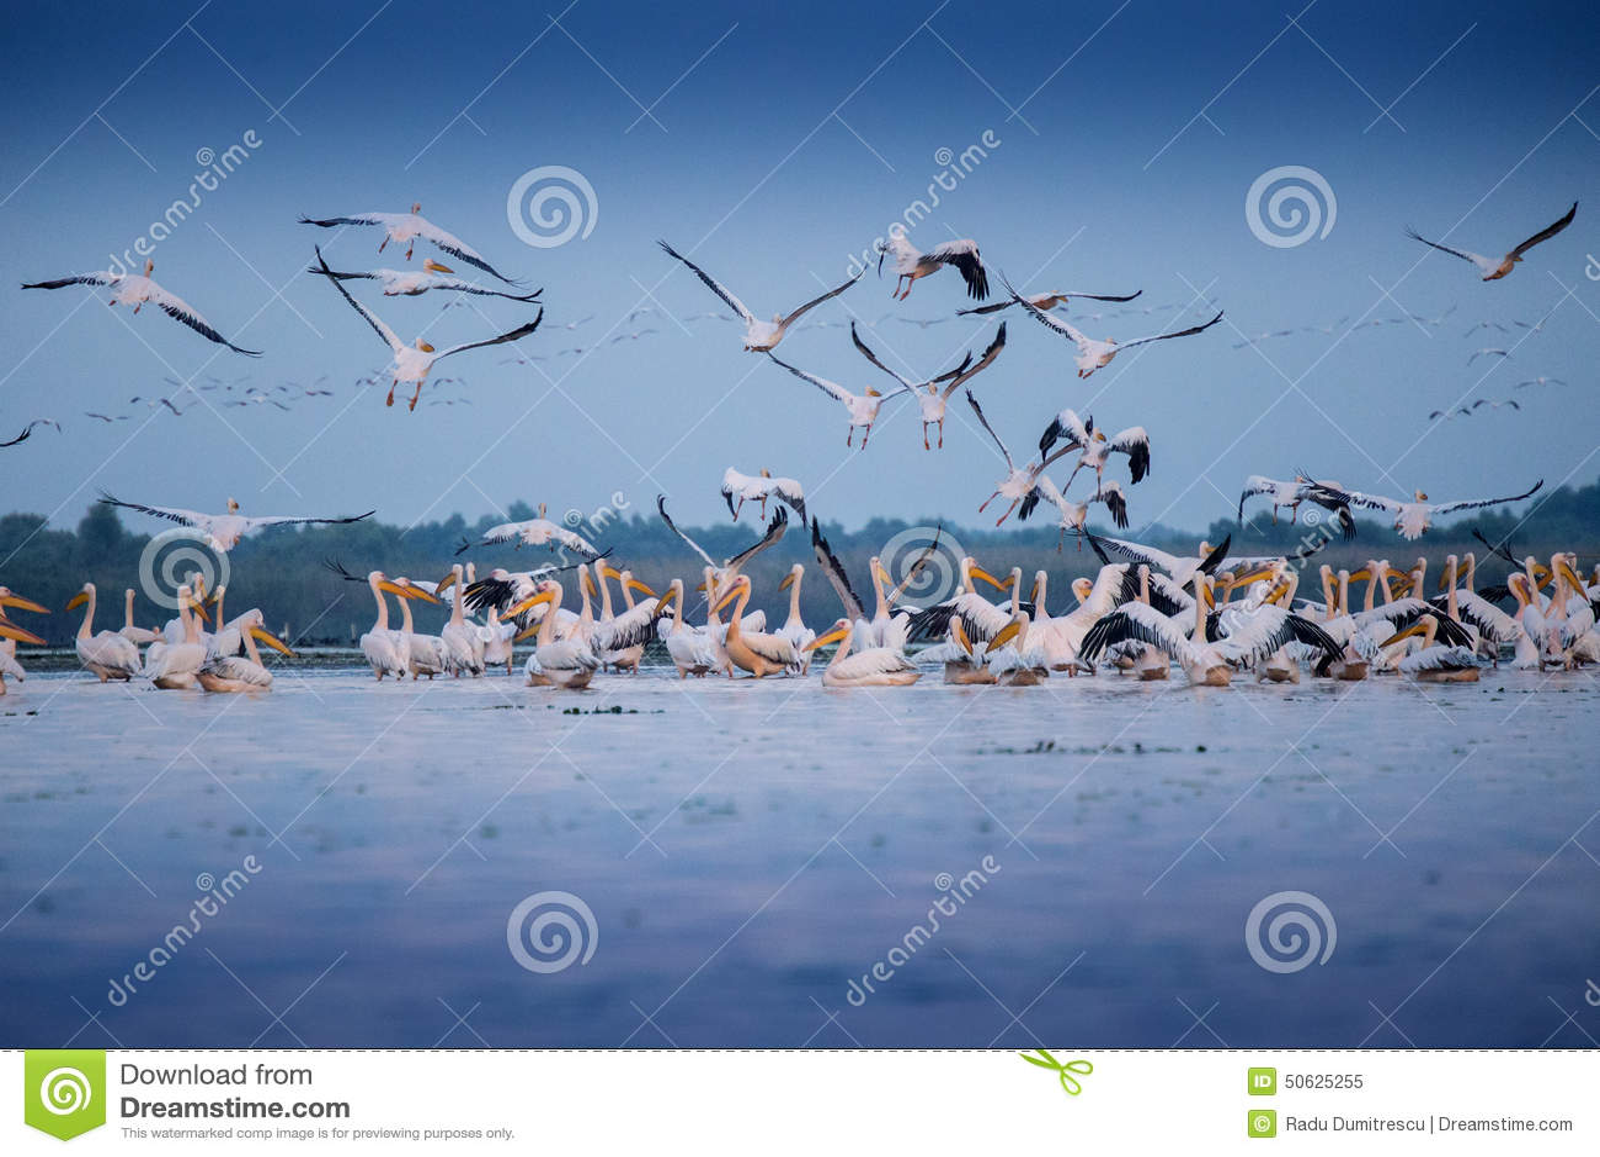 Download Pelicans from Danube Delta stock image. Image of pelicans - 50625255